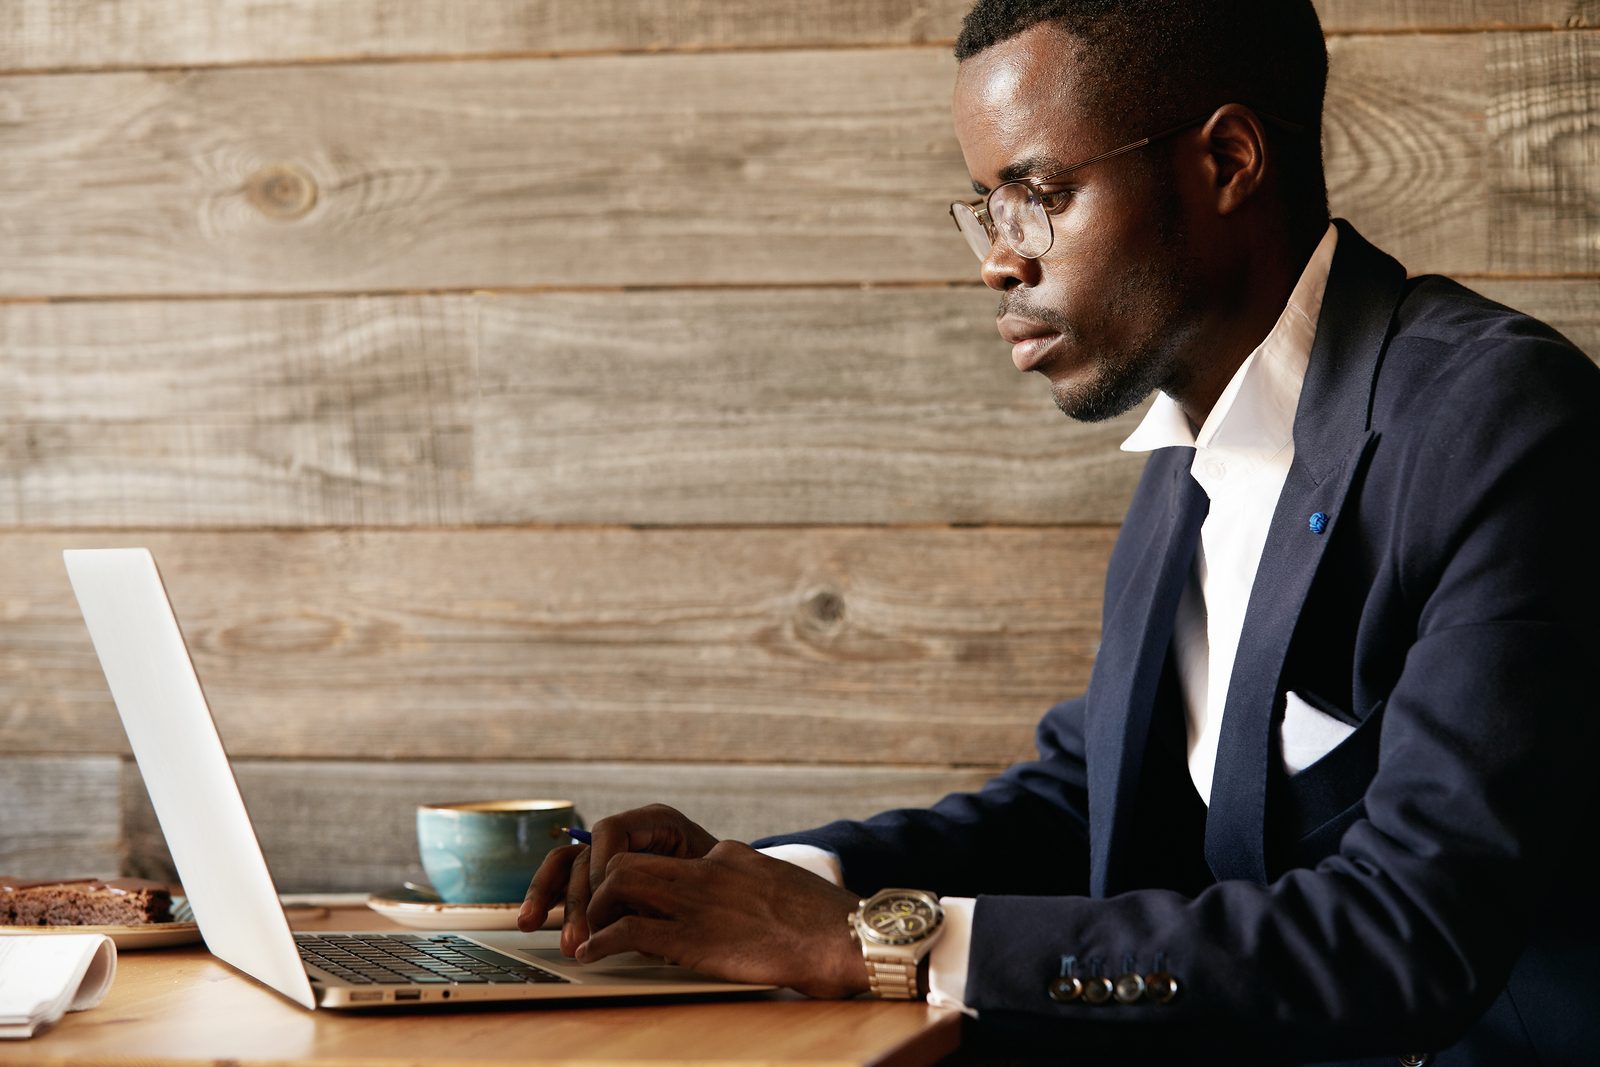 Young man picks a health insurance plan online